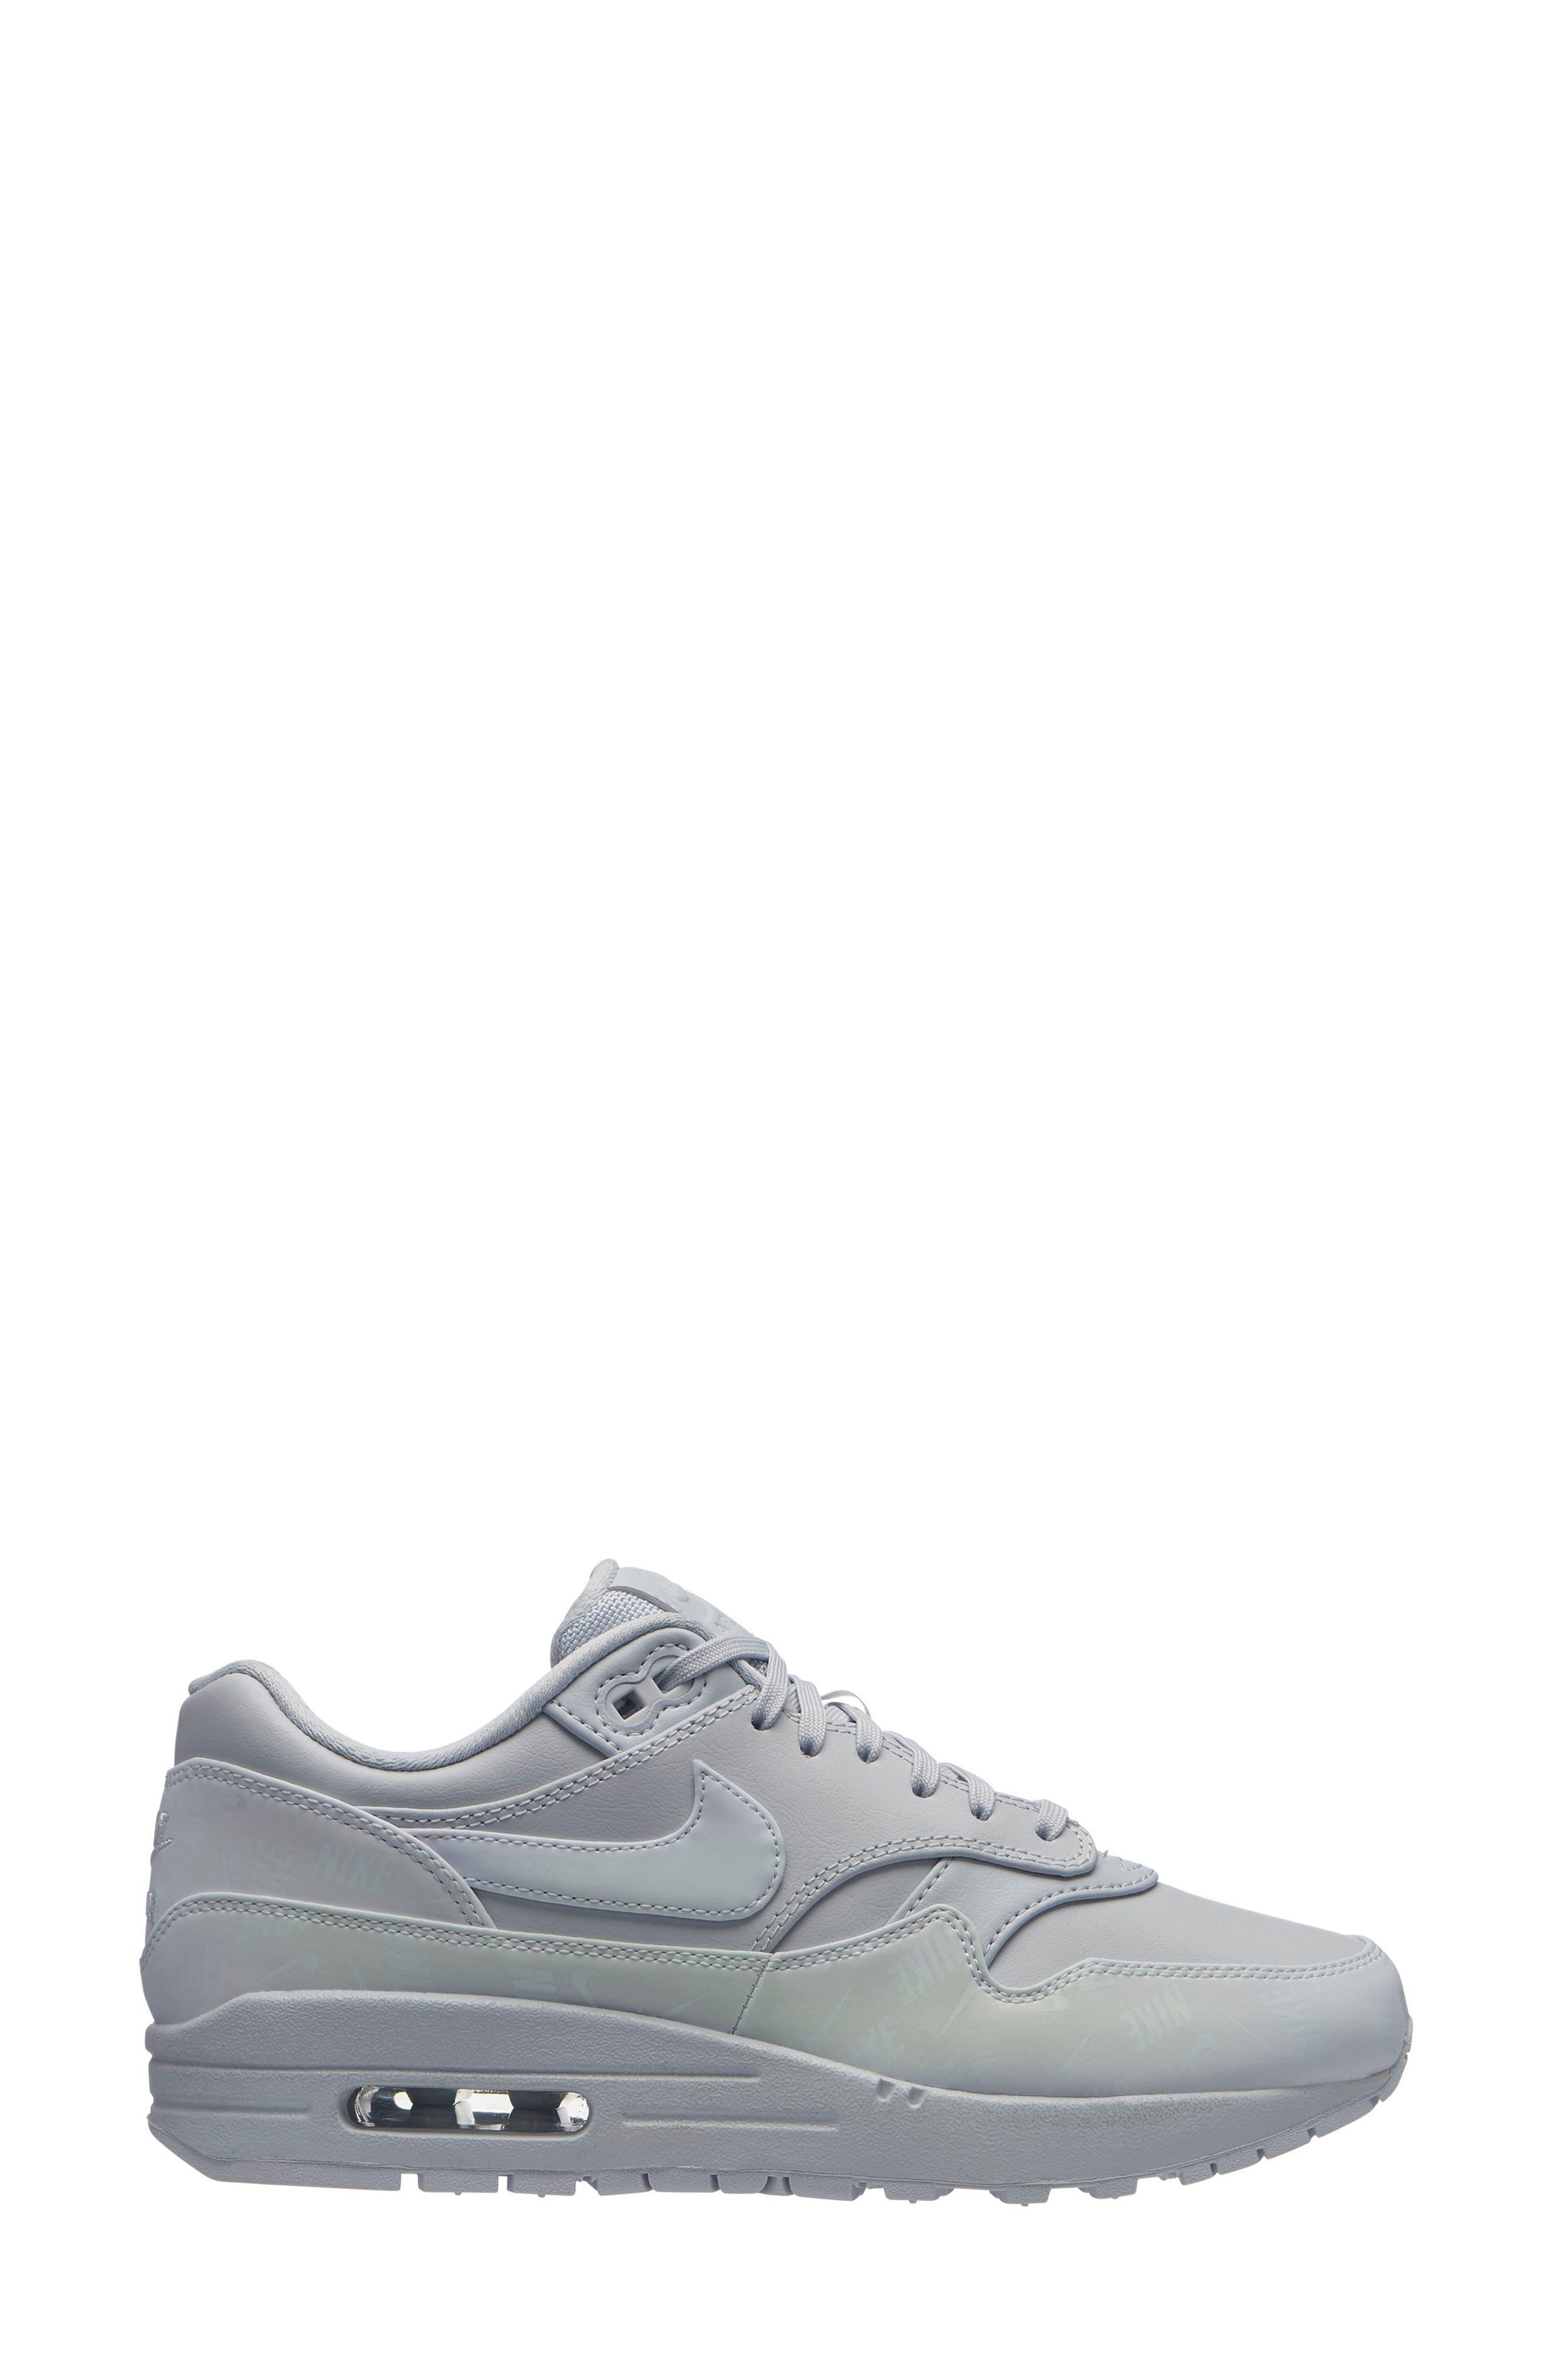 NIKE Air Max 1 Lux Sneaker, Main, color, PURE PLATINUM/ PURE PLATINUM